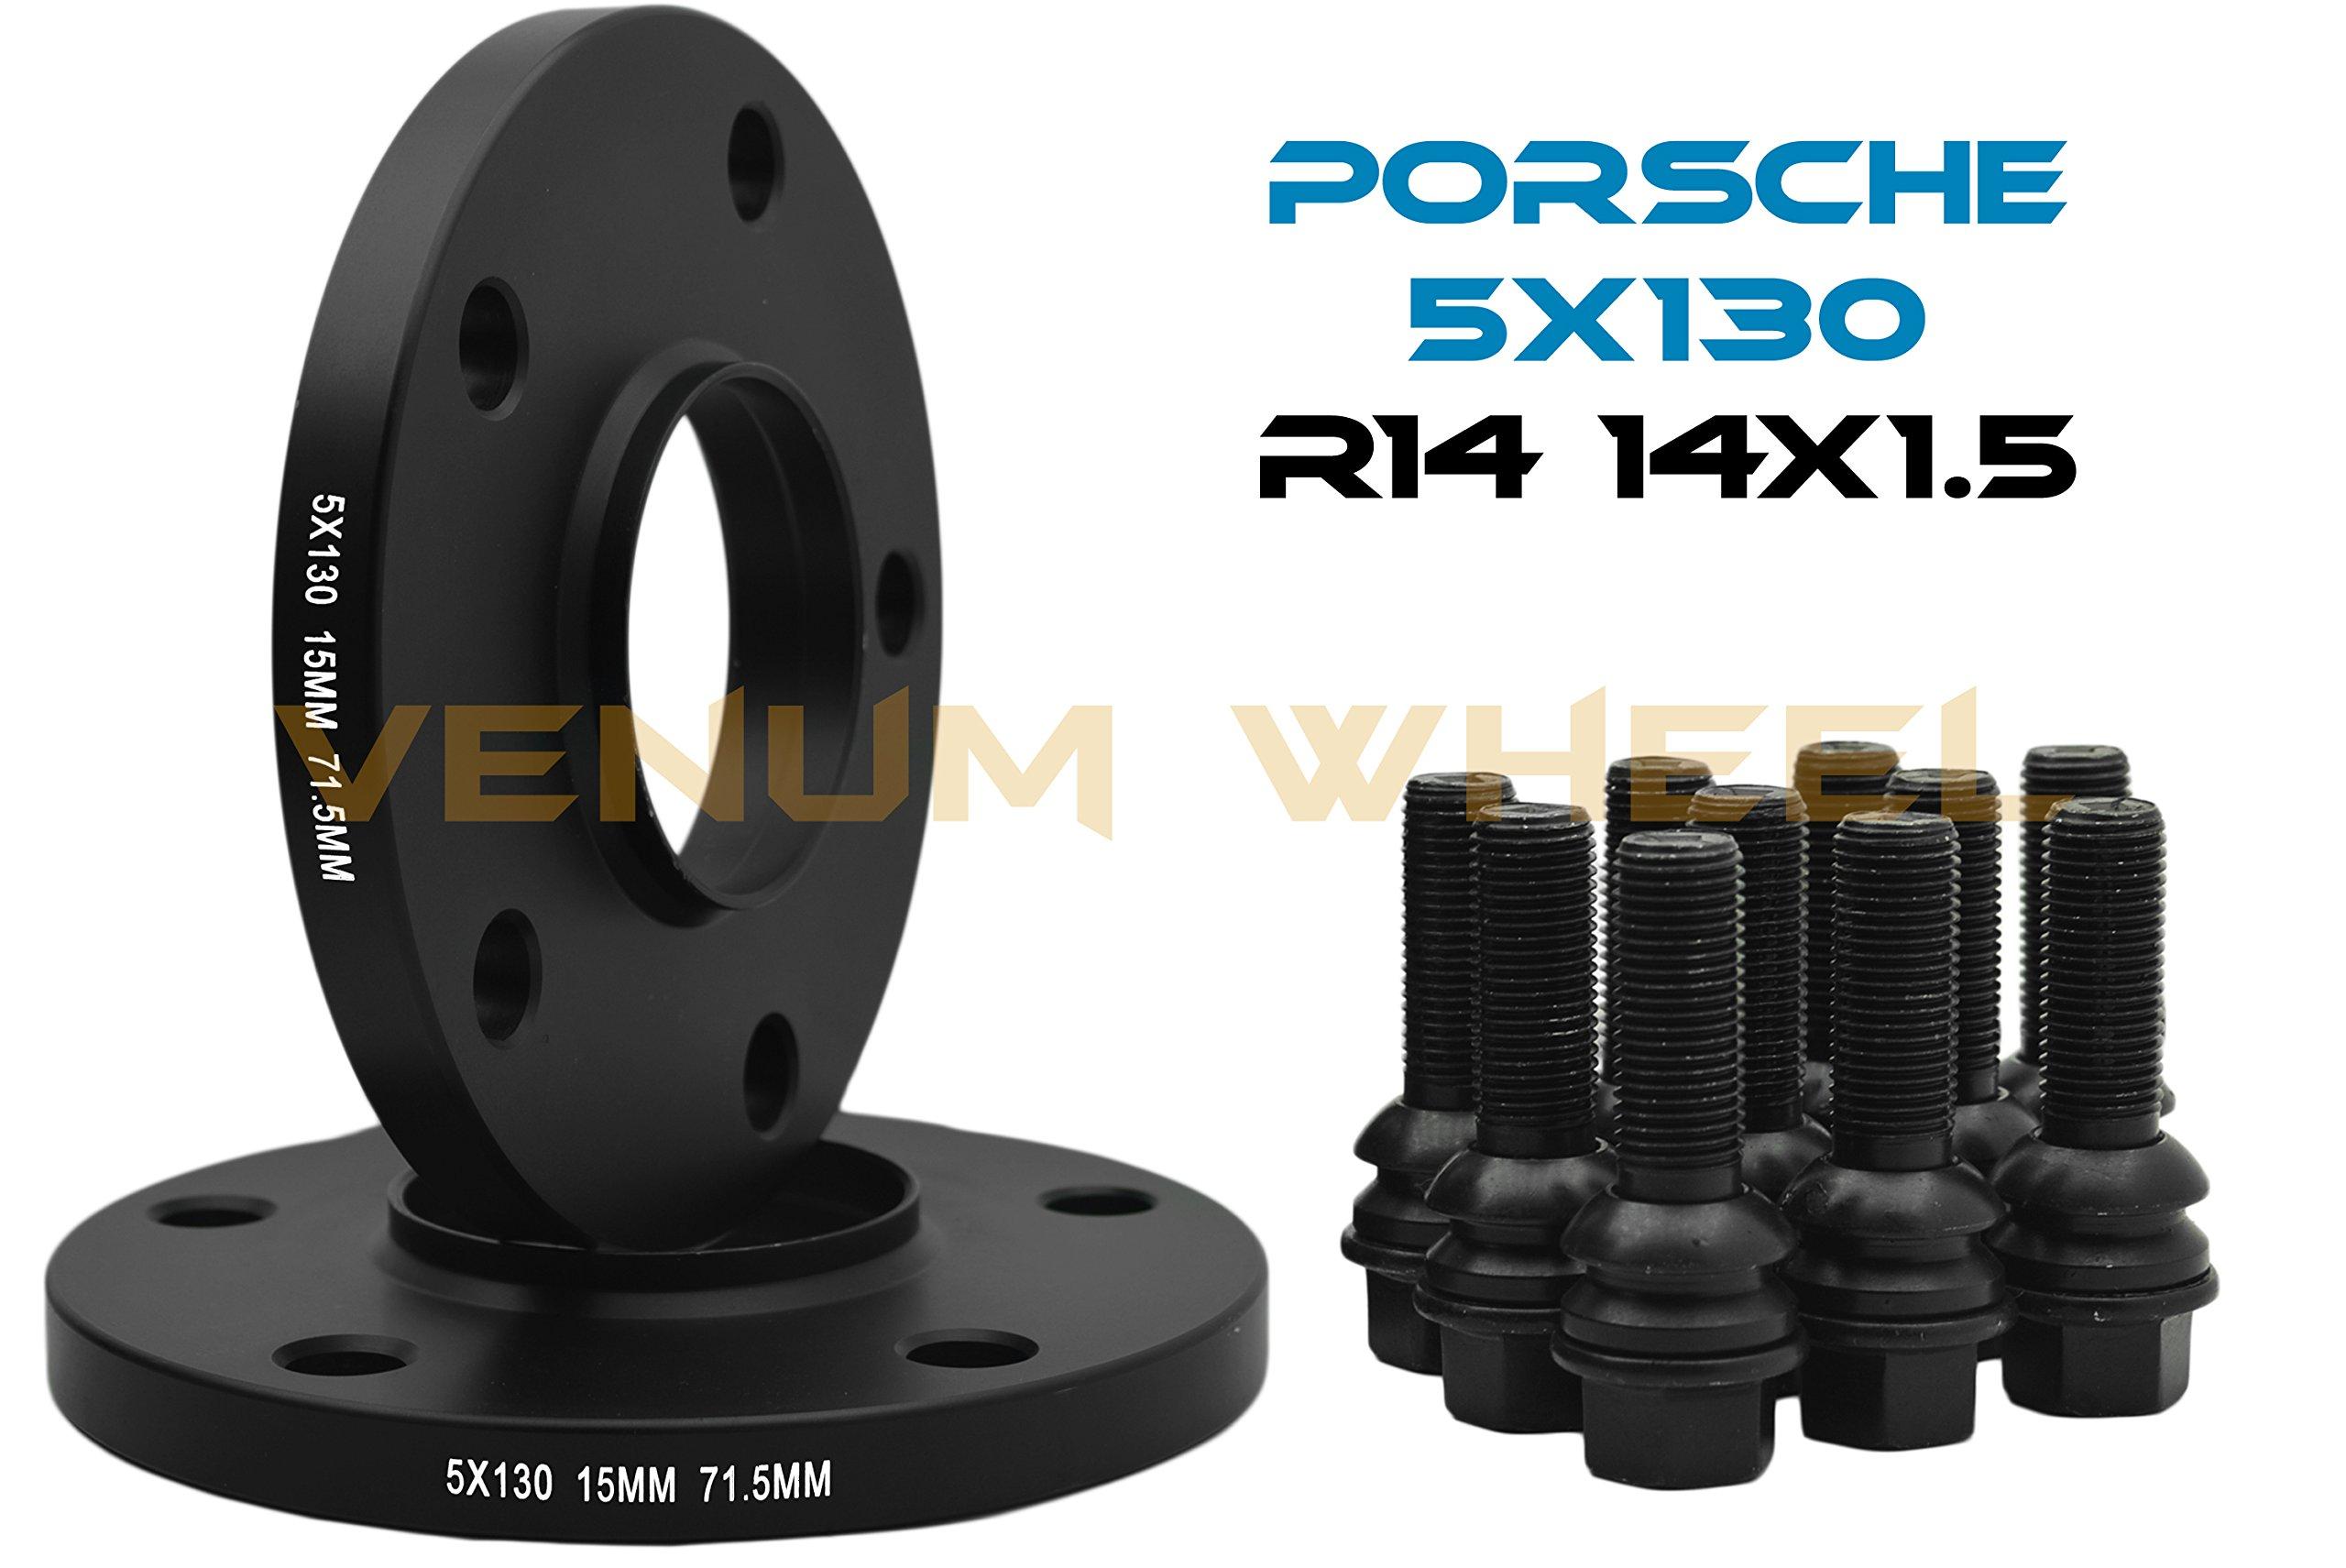 2 Pc Black Porsche Wheel Spacers   Hub Centric   15 mm Thick   5x130 mm 71.5 H.B Fits Porsche 911 924 928 Boxter Cayman Panamera